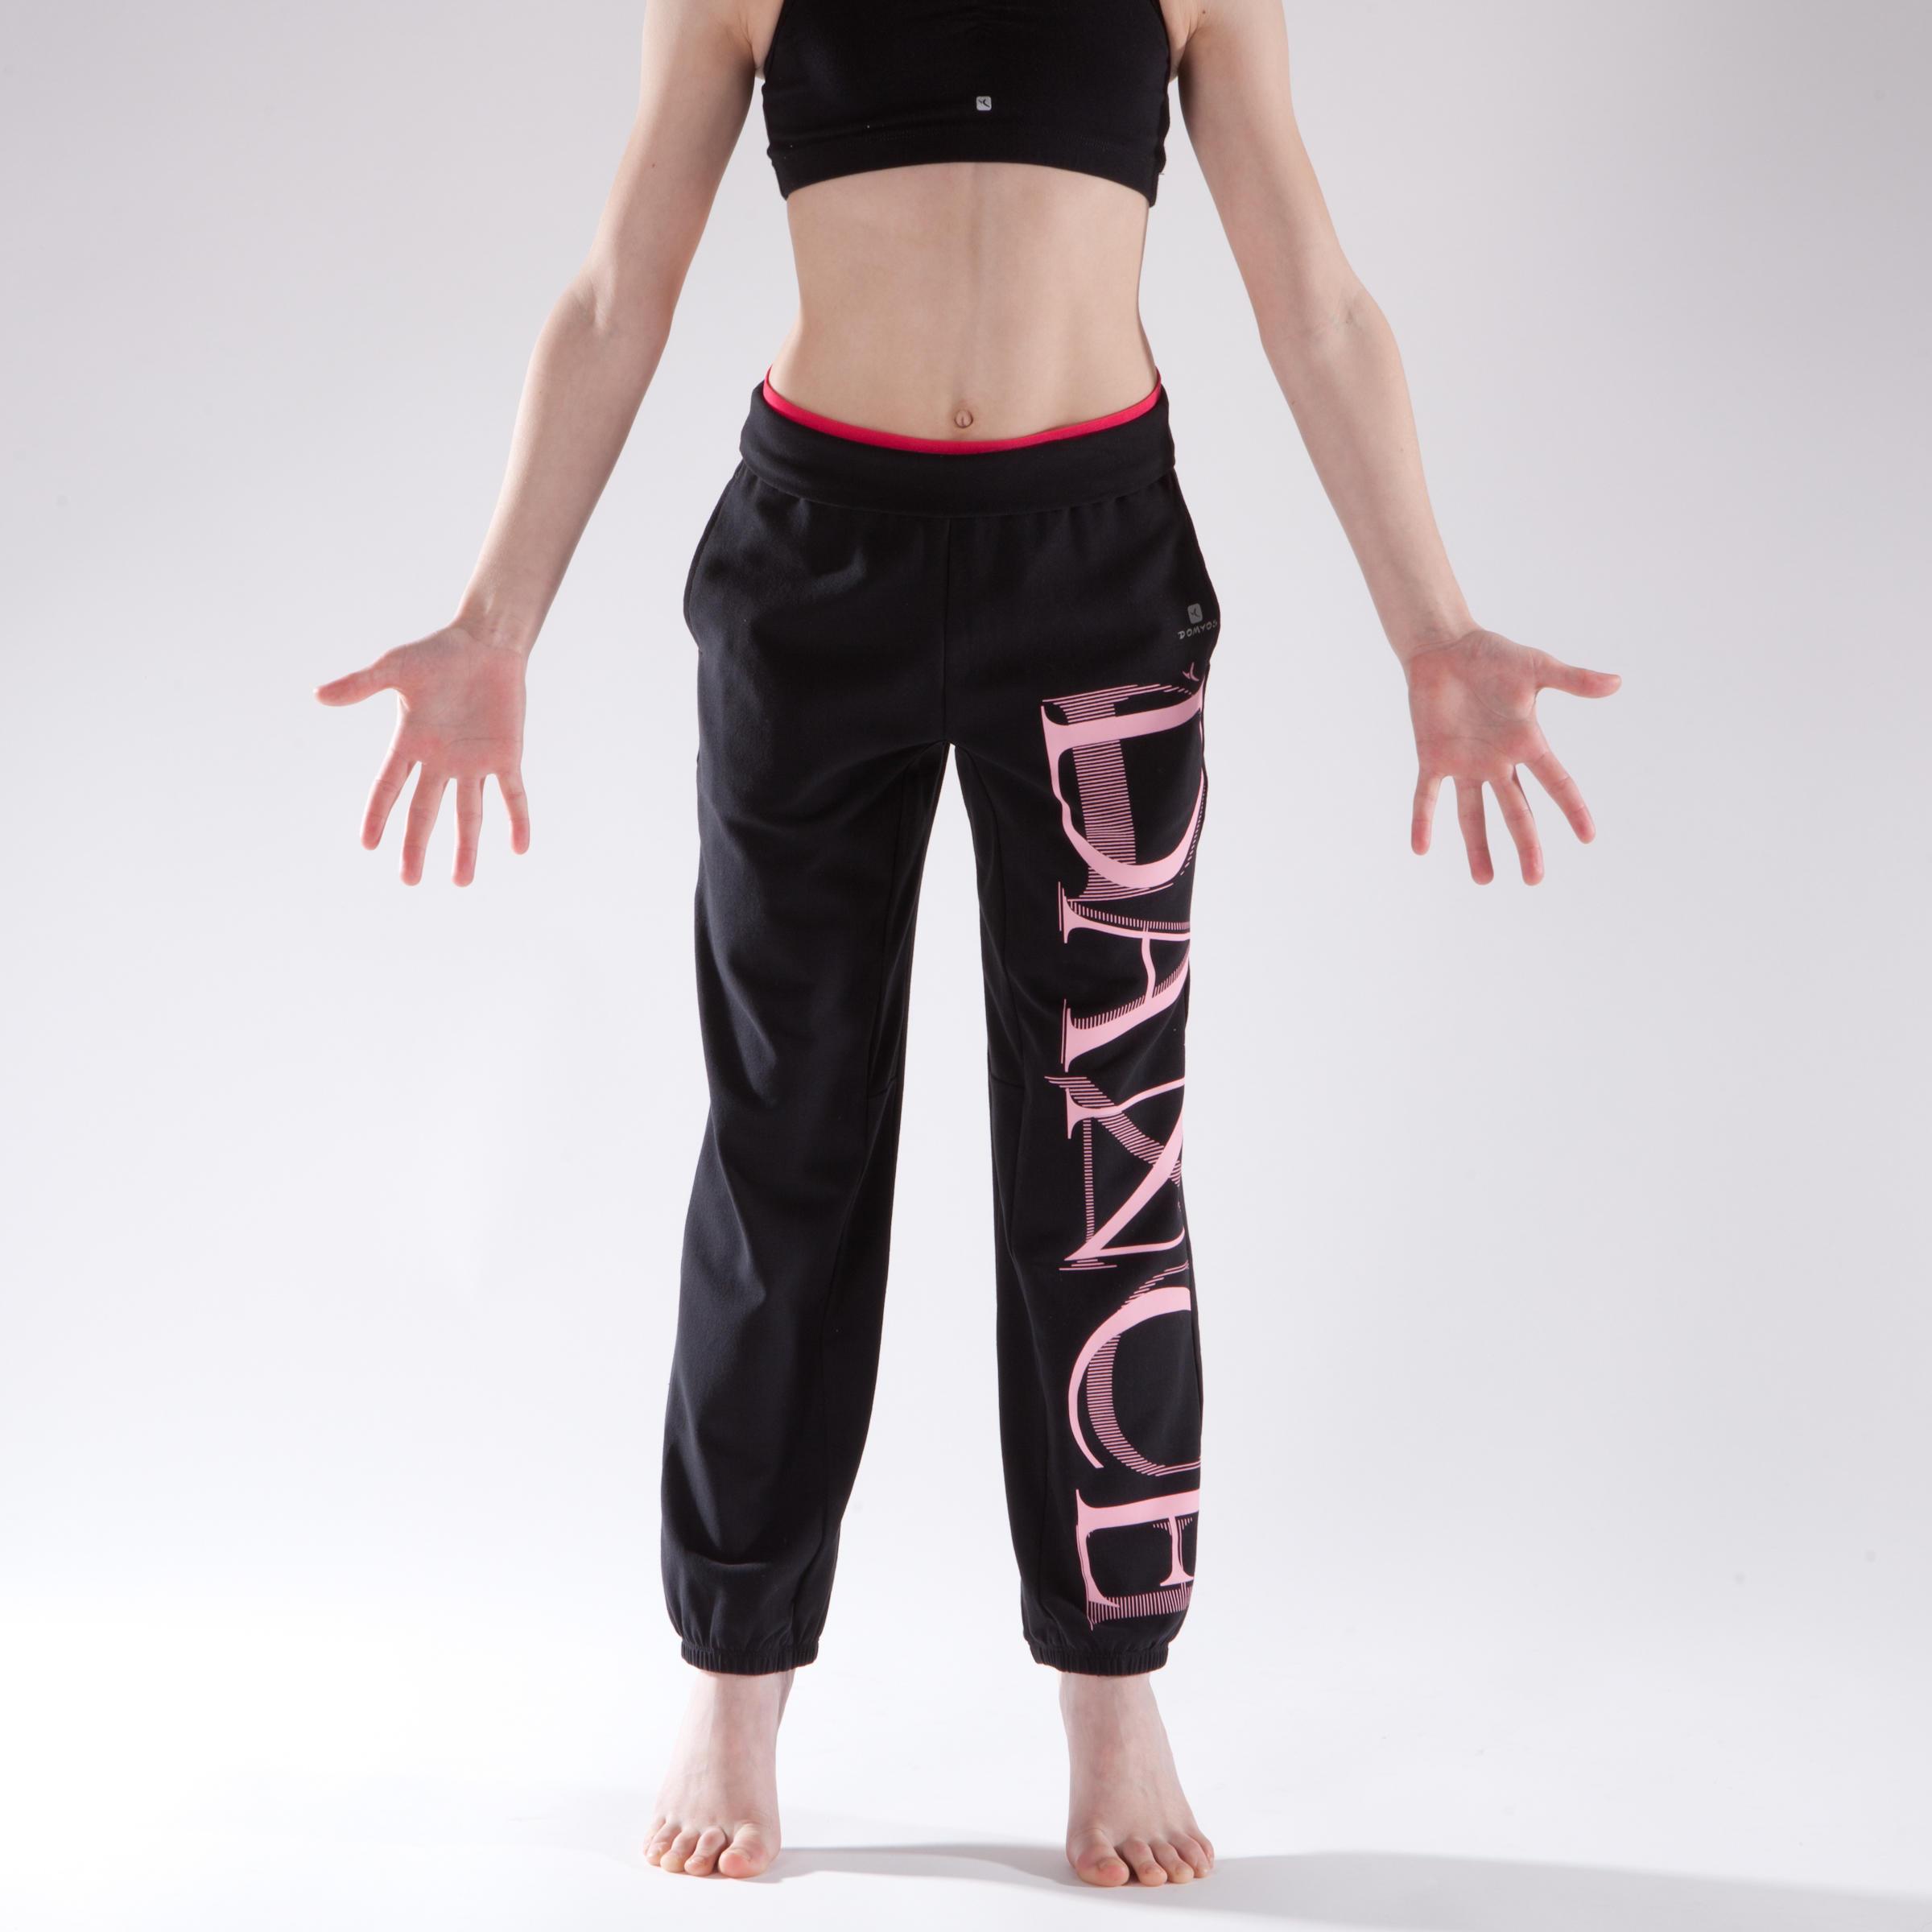 Girls' Elastic Waist and Hem Dance Bottoms - Black